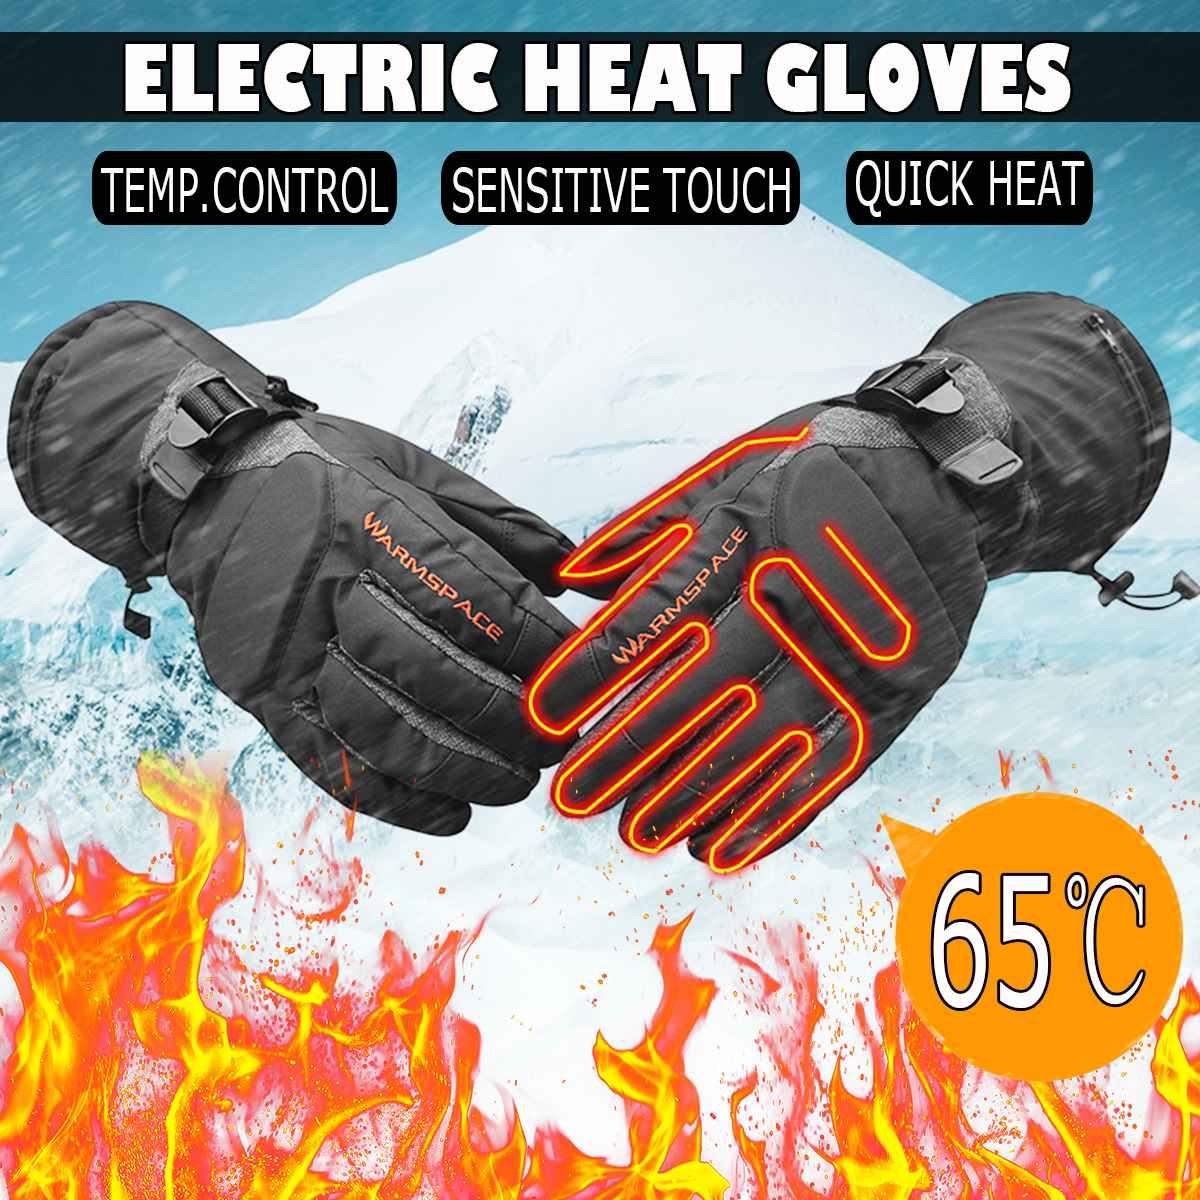 Motorcycle Waterproof Elecric Battery Heated Gloves Warm Winter Riding Ski Glove